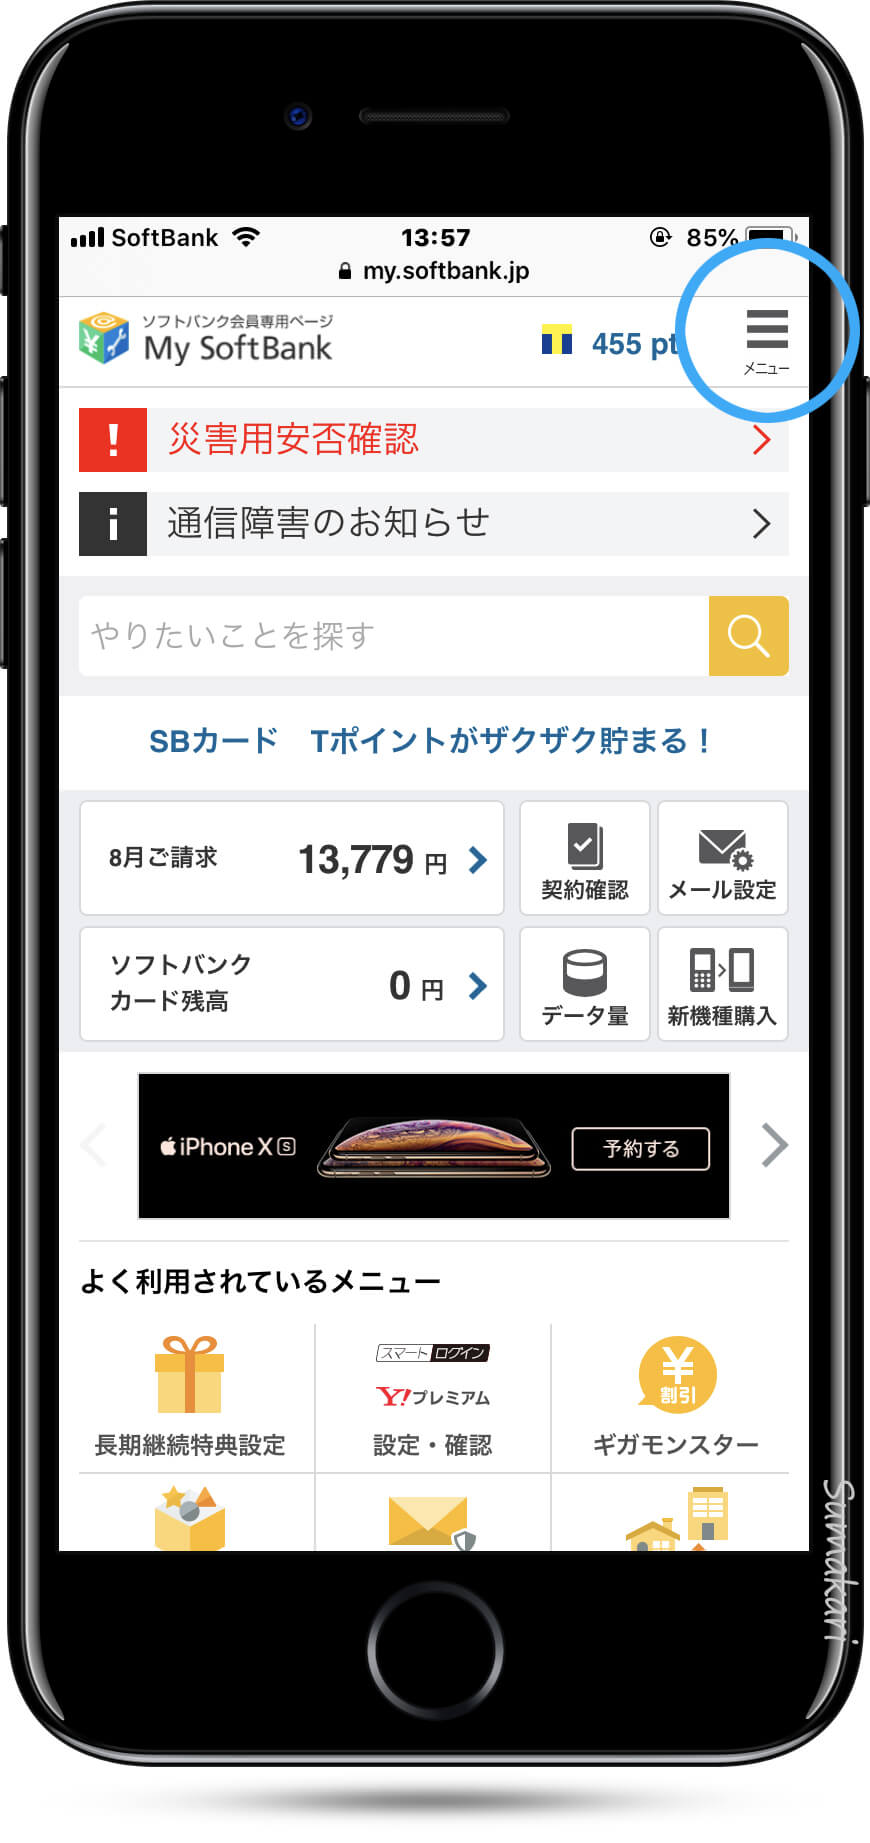 My Softbank 会員専用ページで右上メニューアイコンをタップ